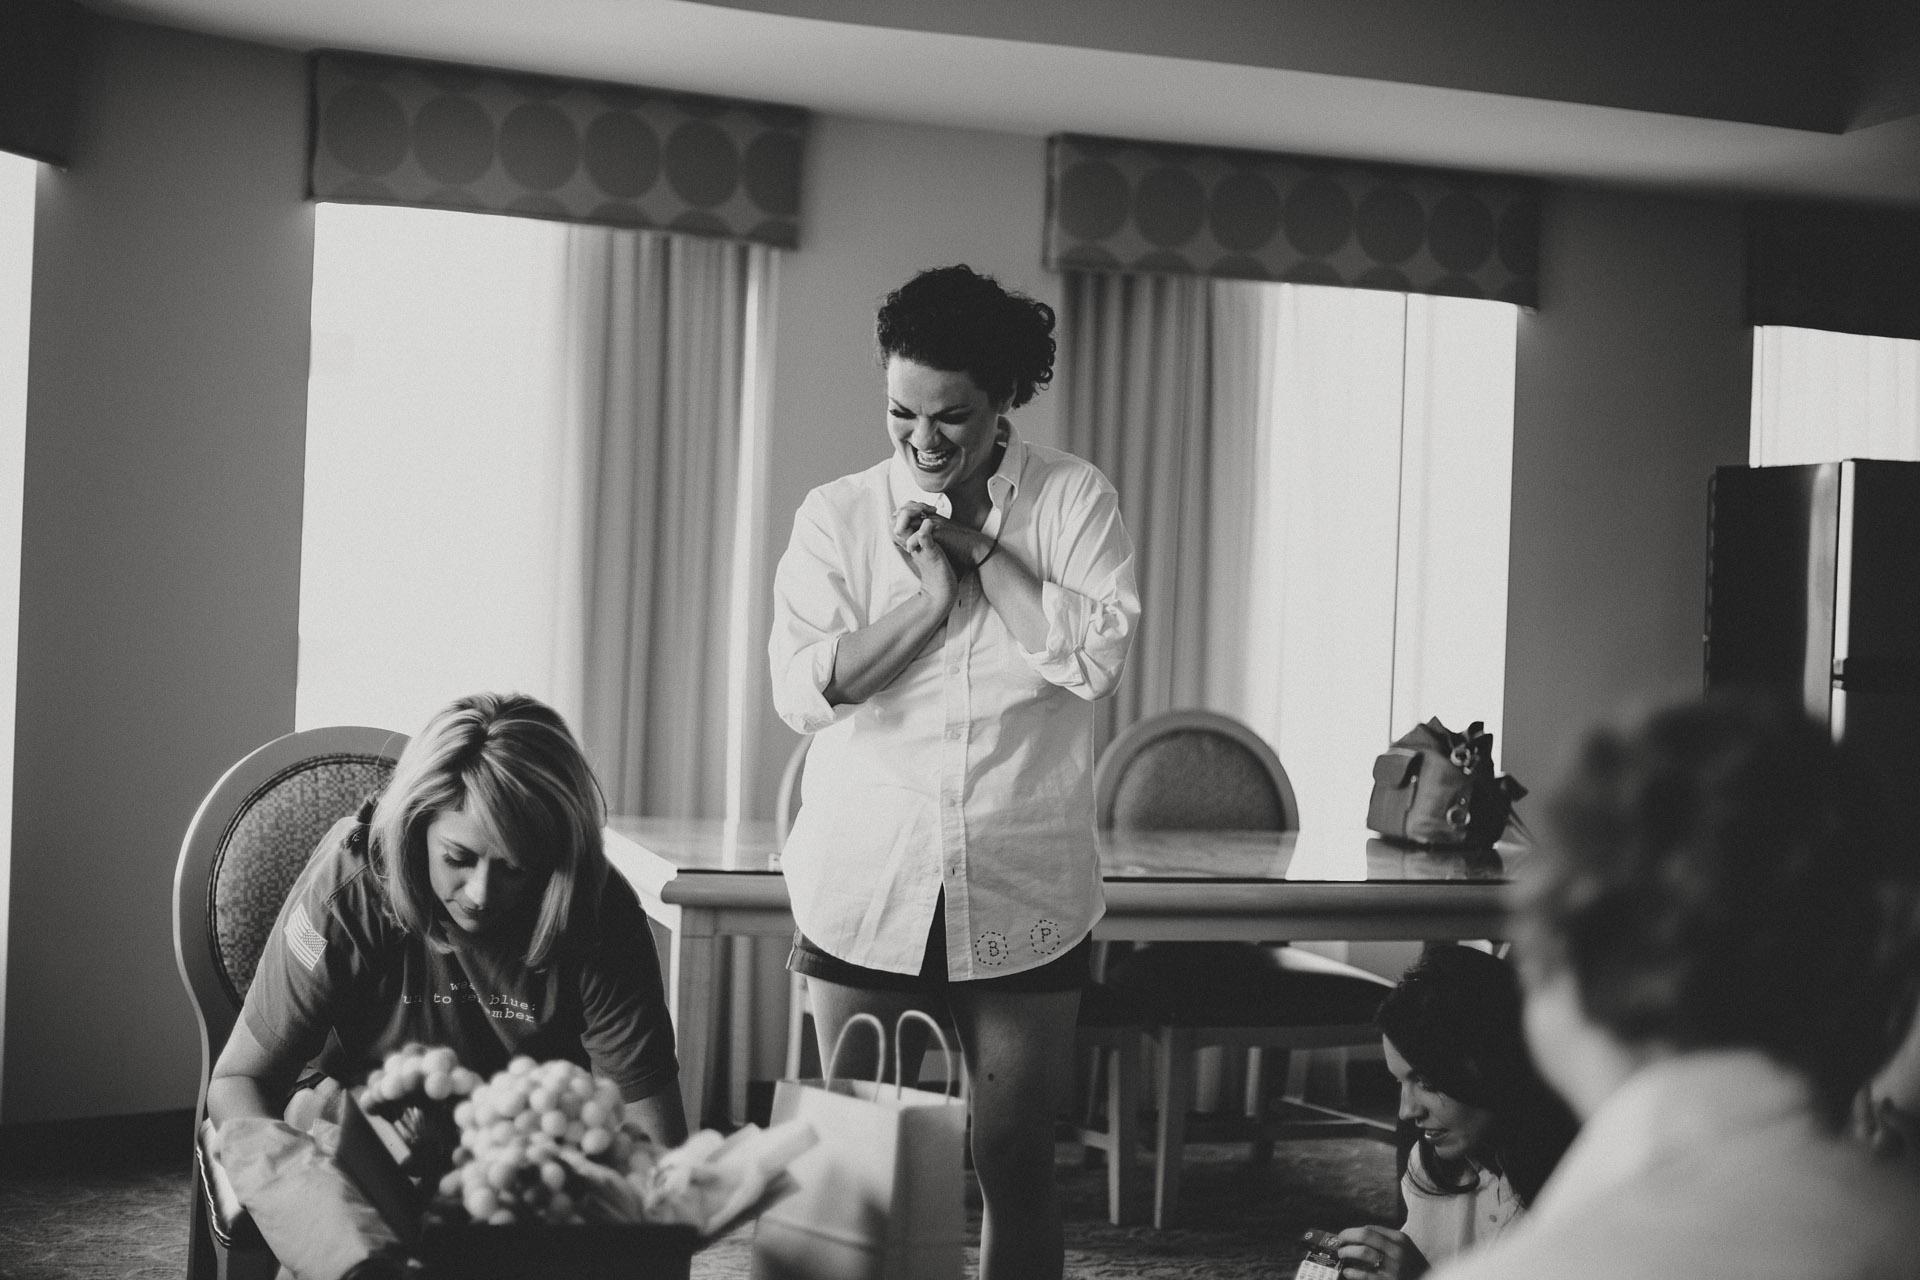 Bethany-Peter-Cincinnati-Pallet-23-Wedding-014.jpg